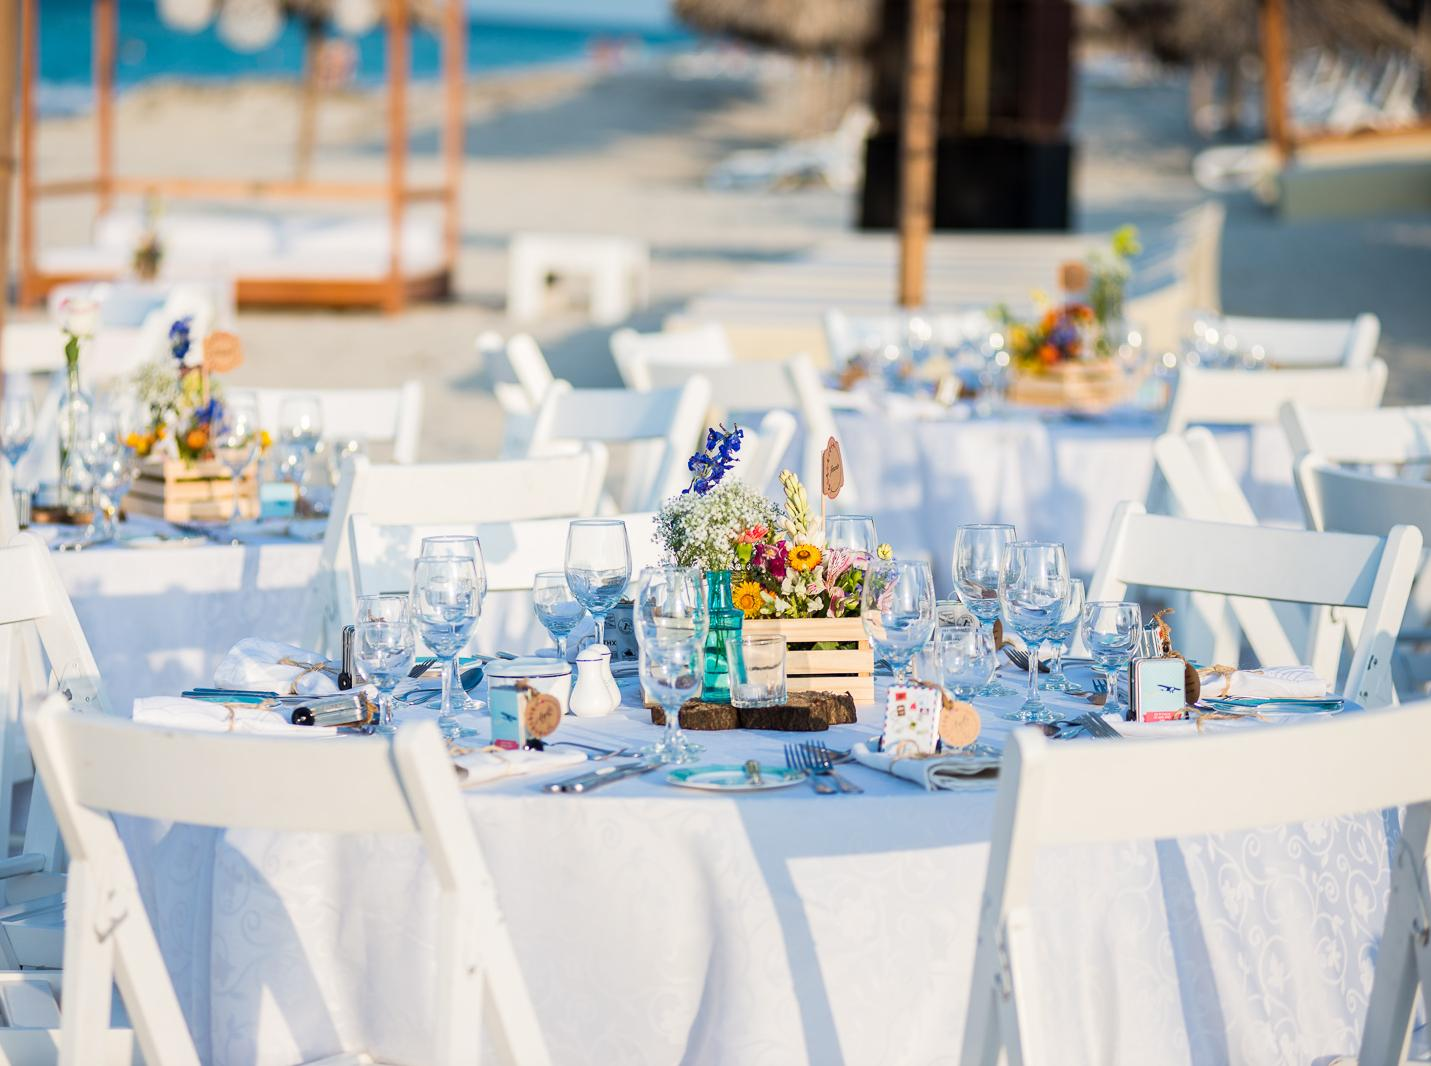 bodas-rustico-playa-cuba-6732.jpg